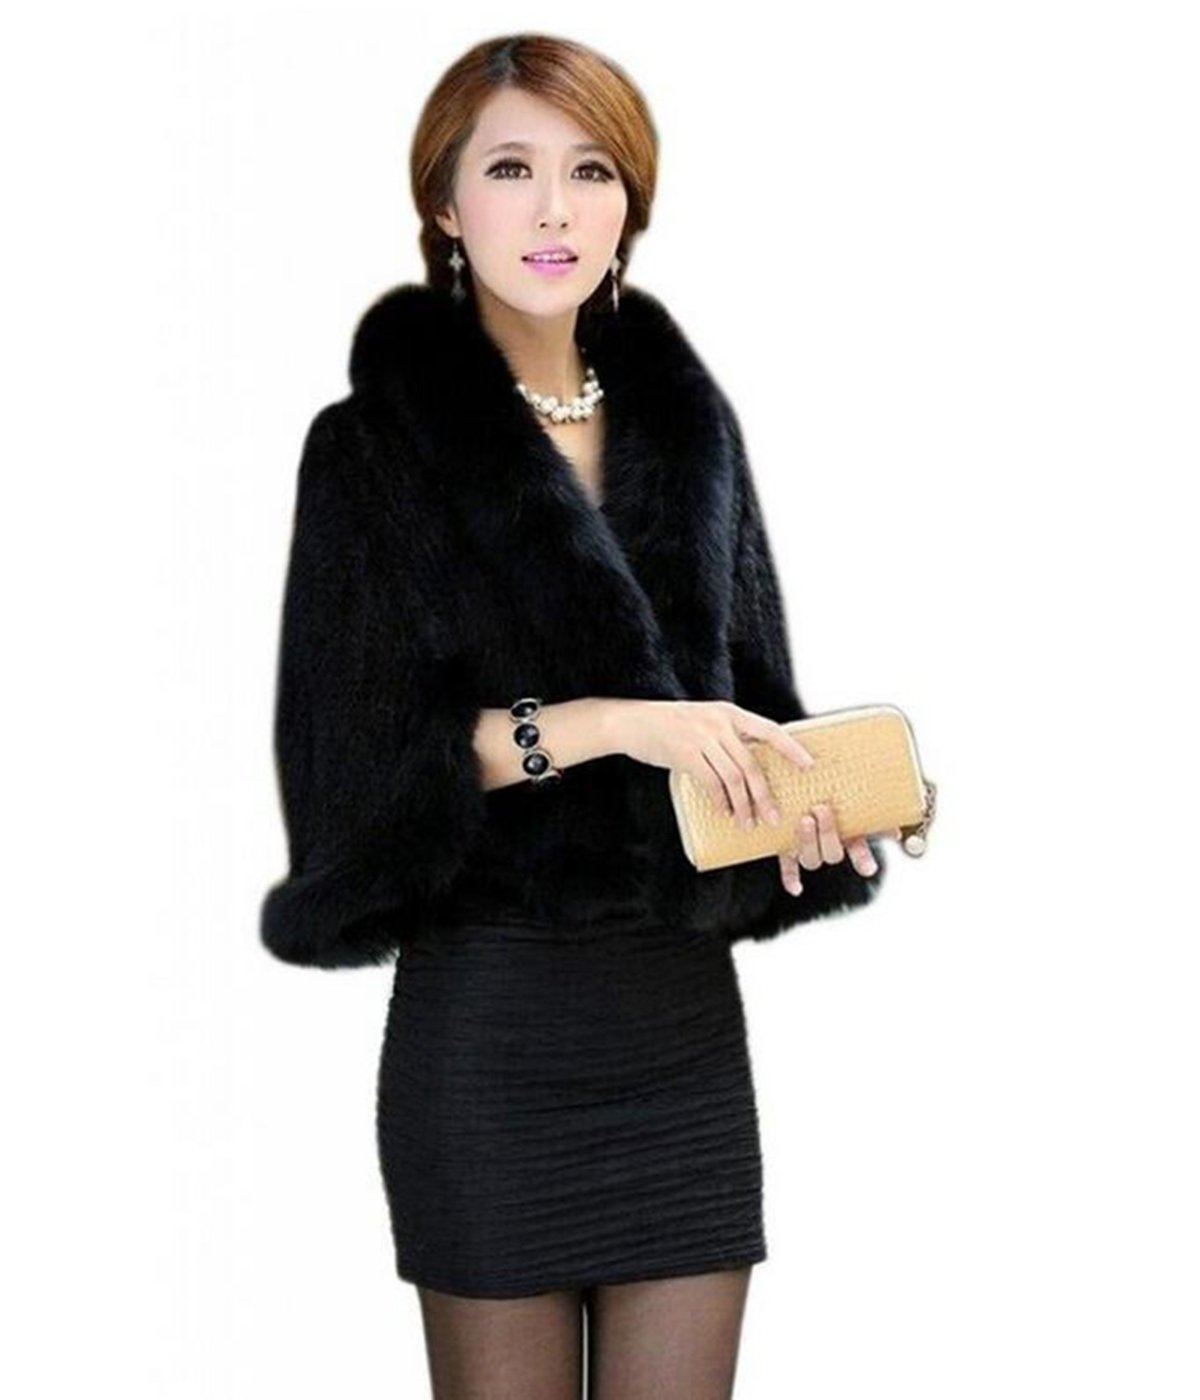 MEEFUR Women's Natural Mink Fur Knitted Cappa Cloak Cape with Fox Fur Collar (Black)